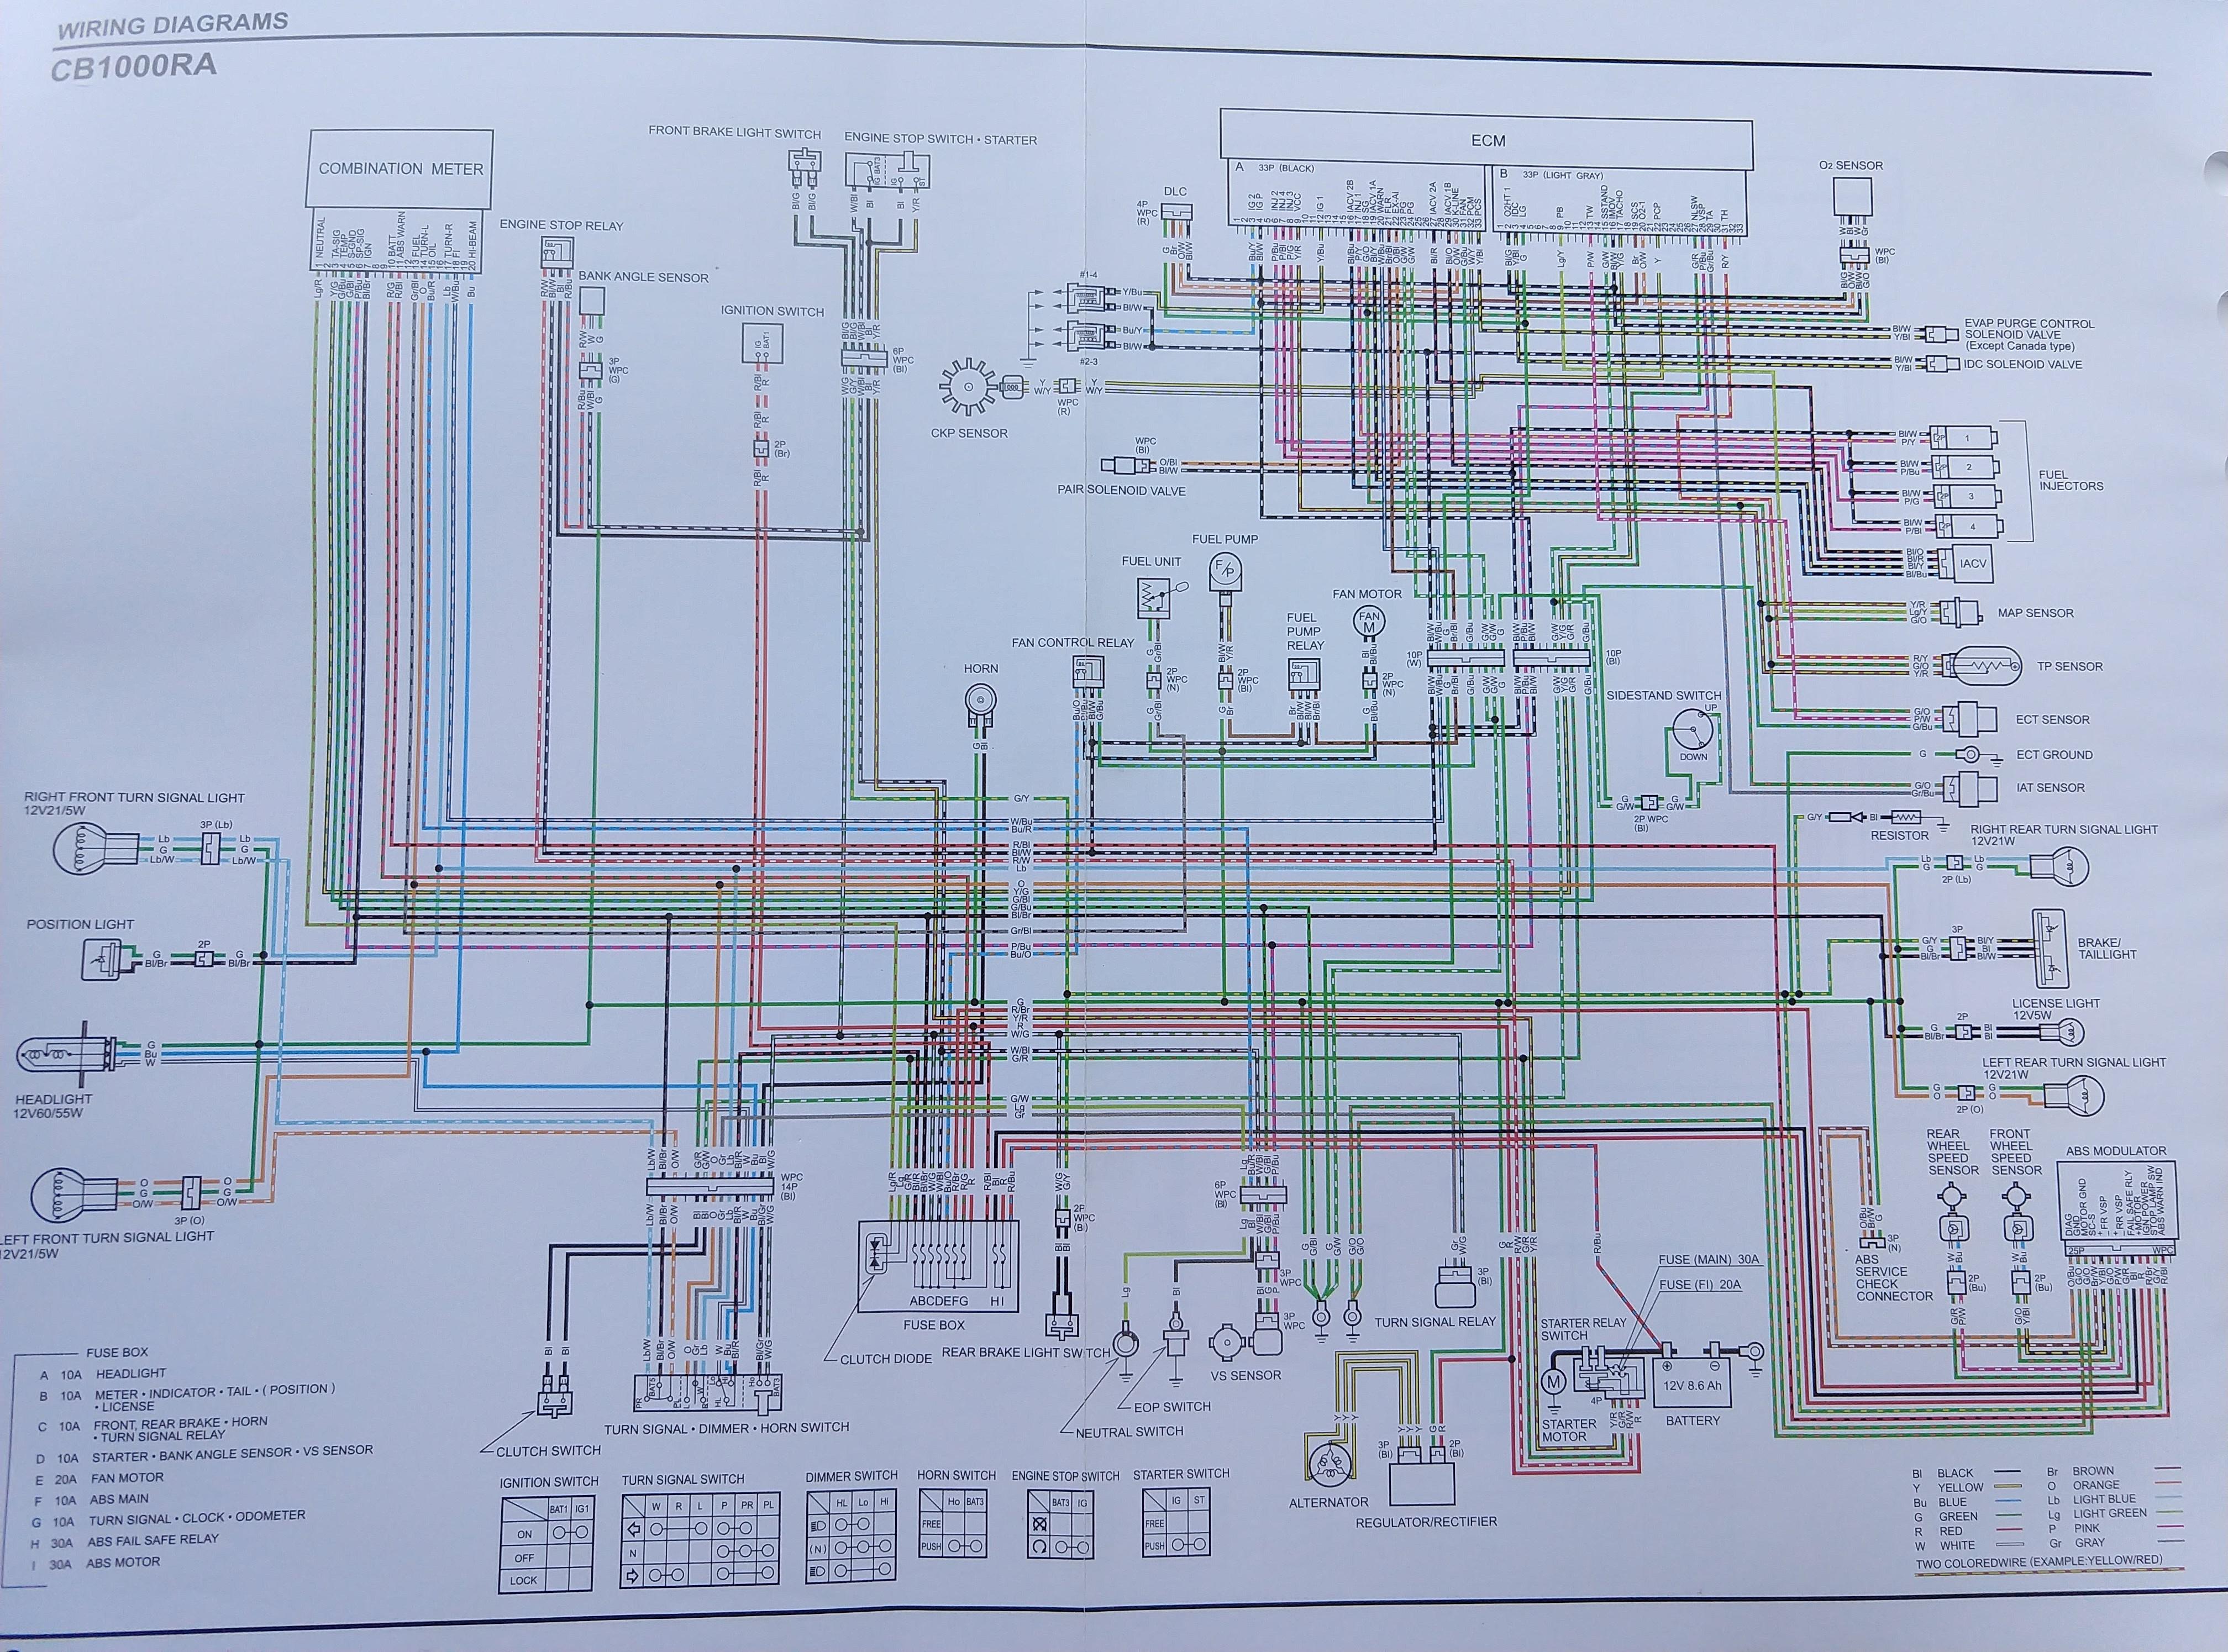 [WQZT_9871]  CB1000R North American specific Wiring Diagram | Honda CB1000R Forum | Honda Cb1000 Wiring Diagram |  | Honda CB1000R Forum